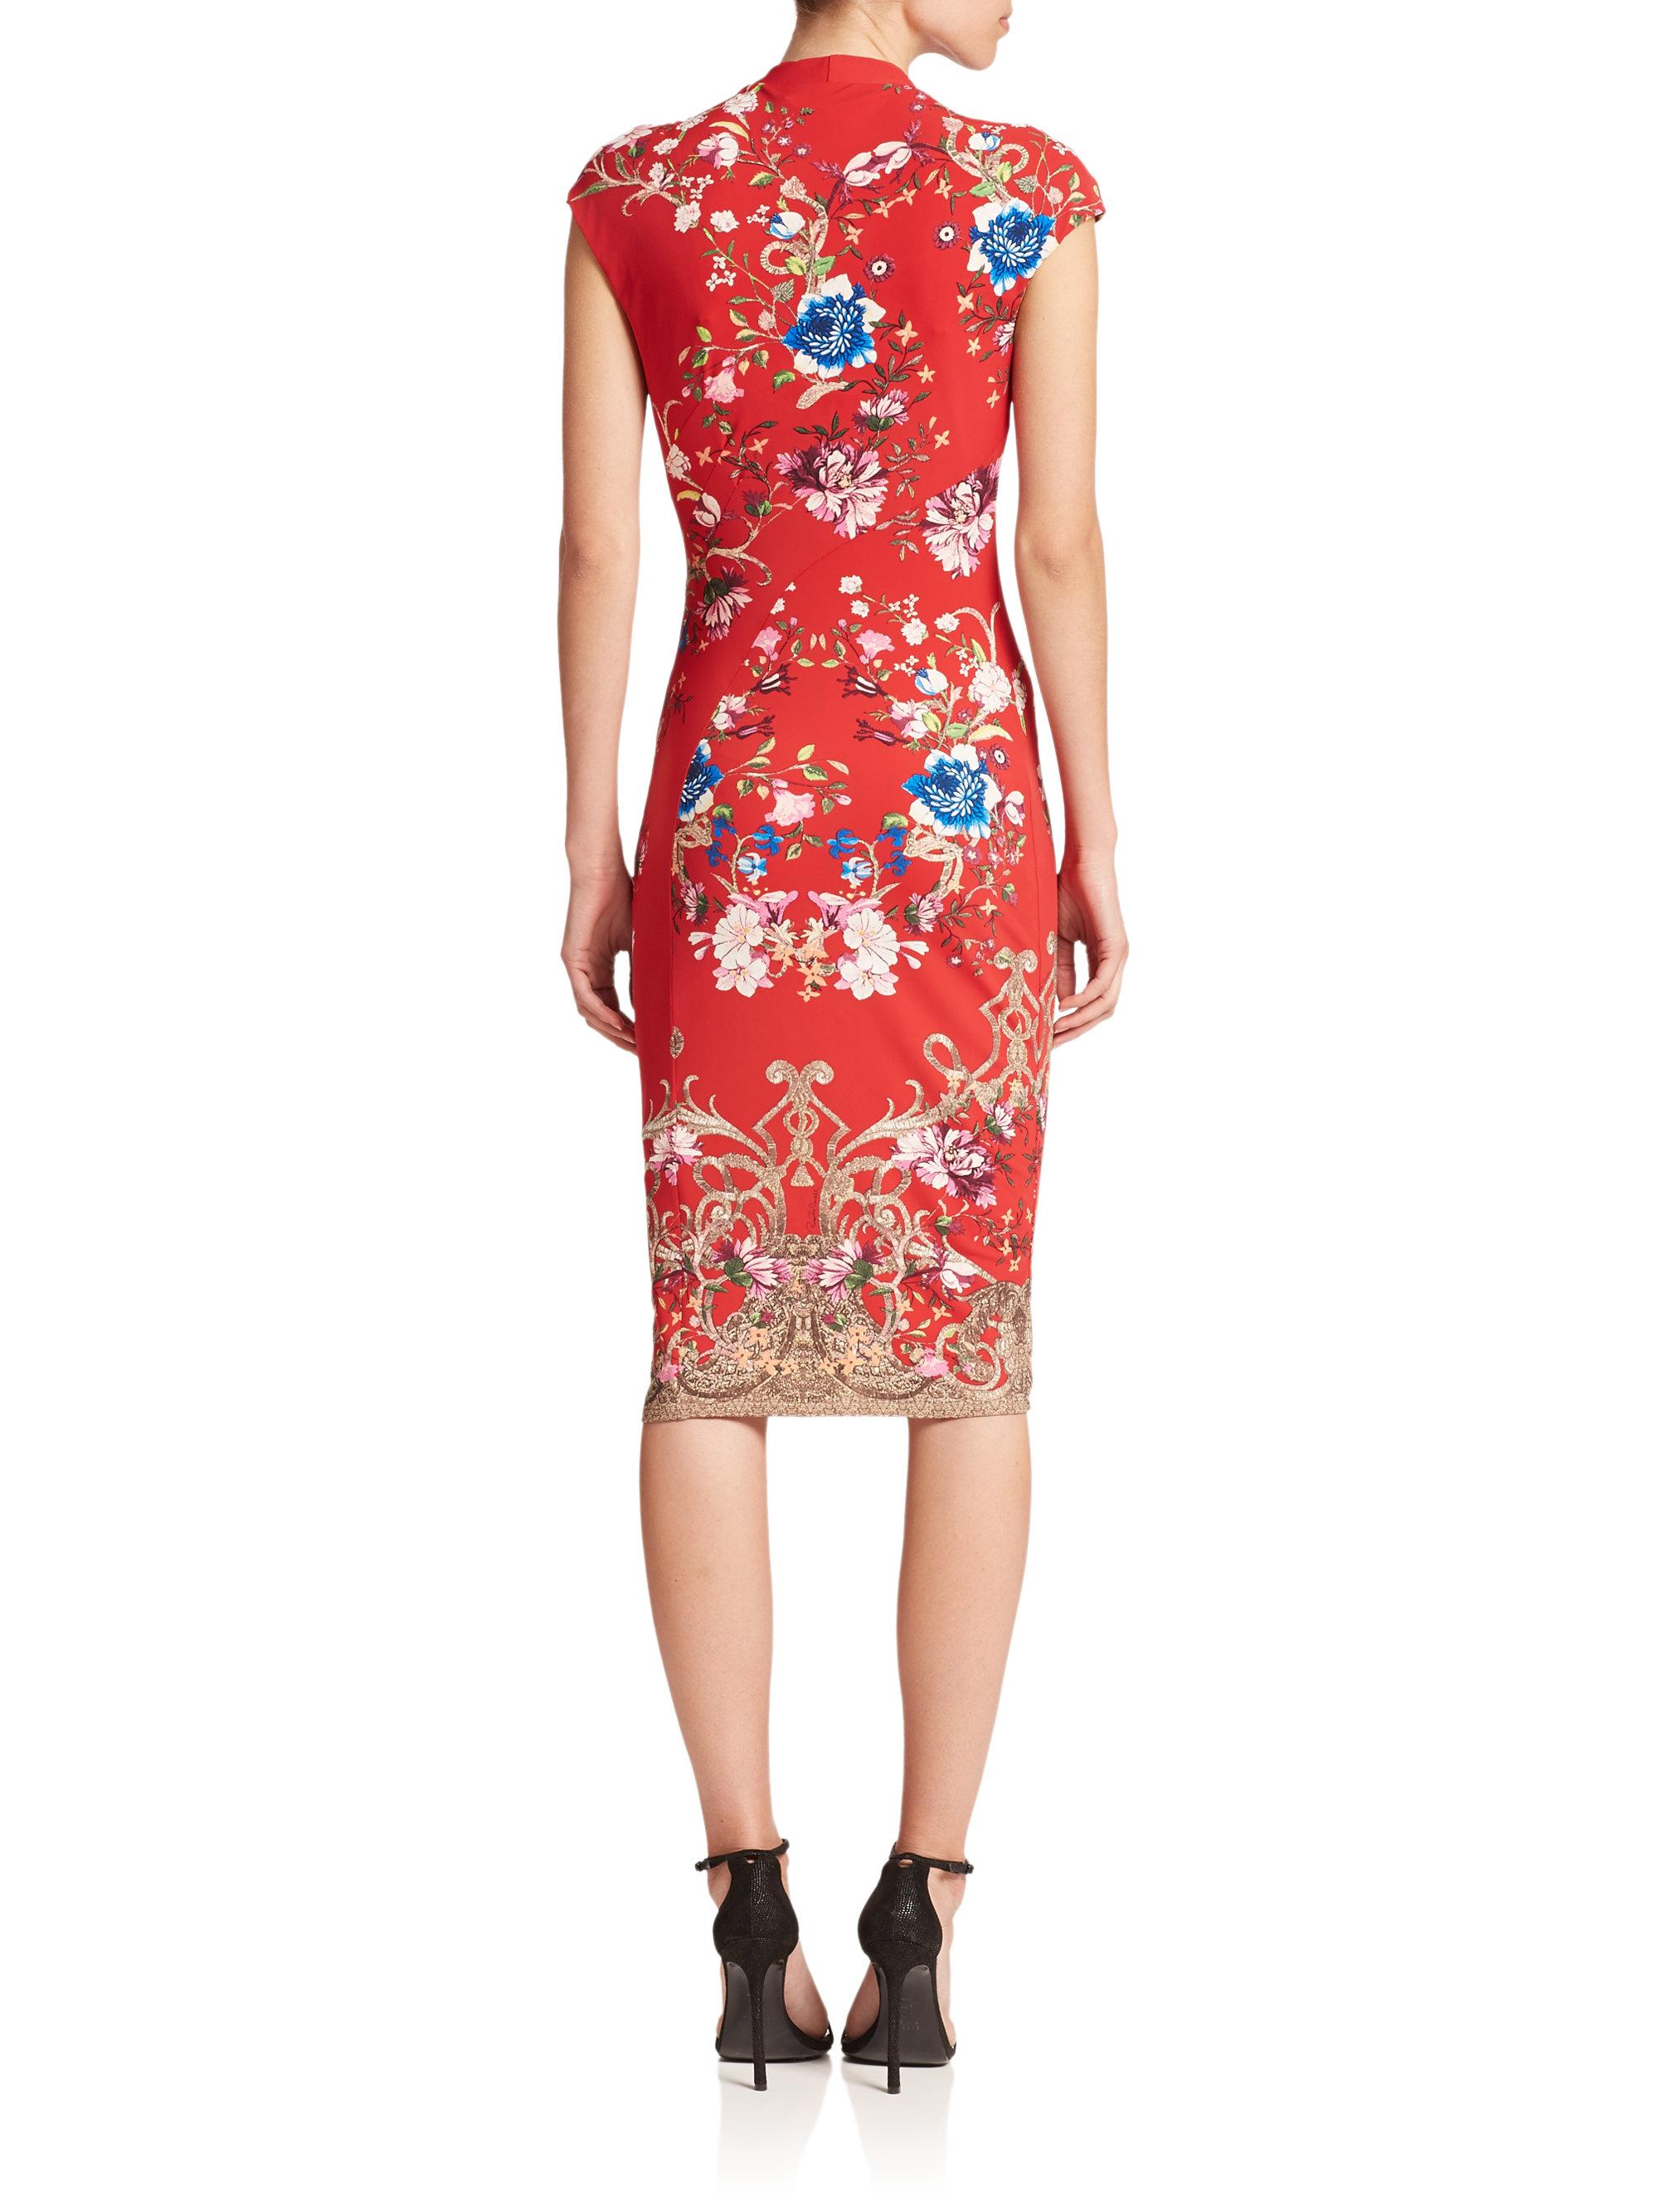 Roberto cavalli Diagonal Floral-print Cap-sleeve Dress in Red | Lyst